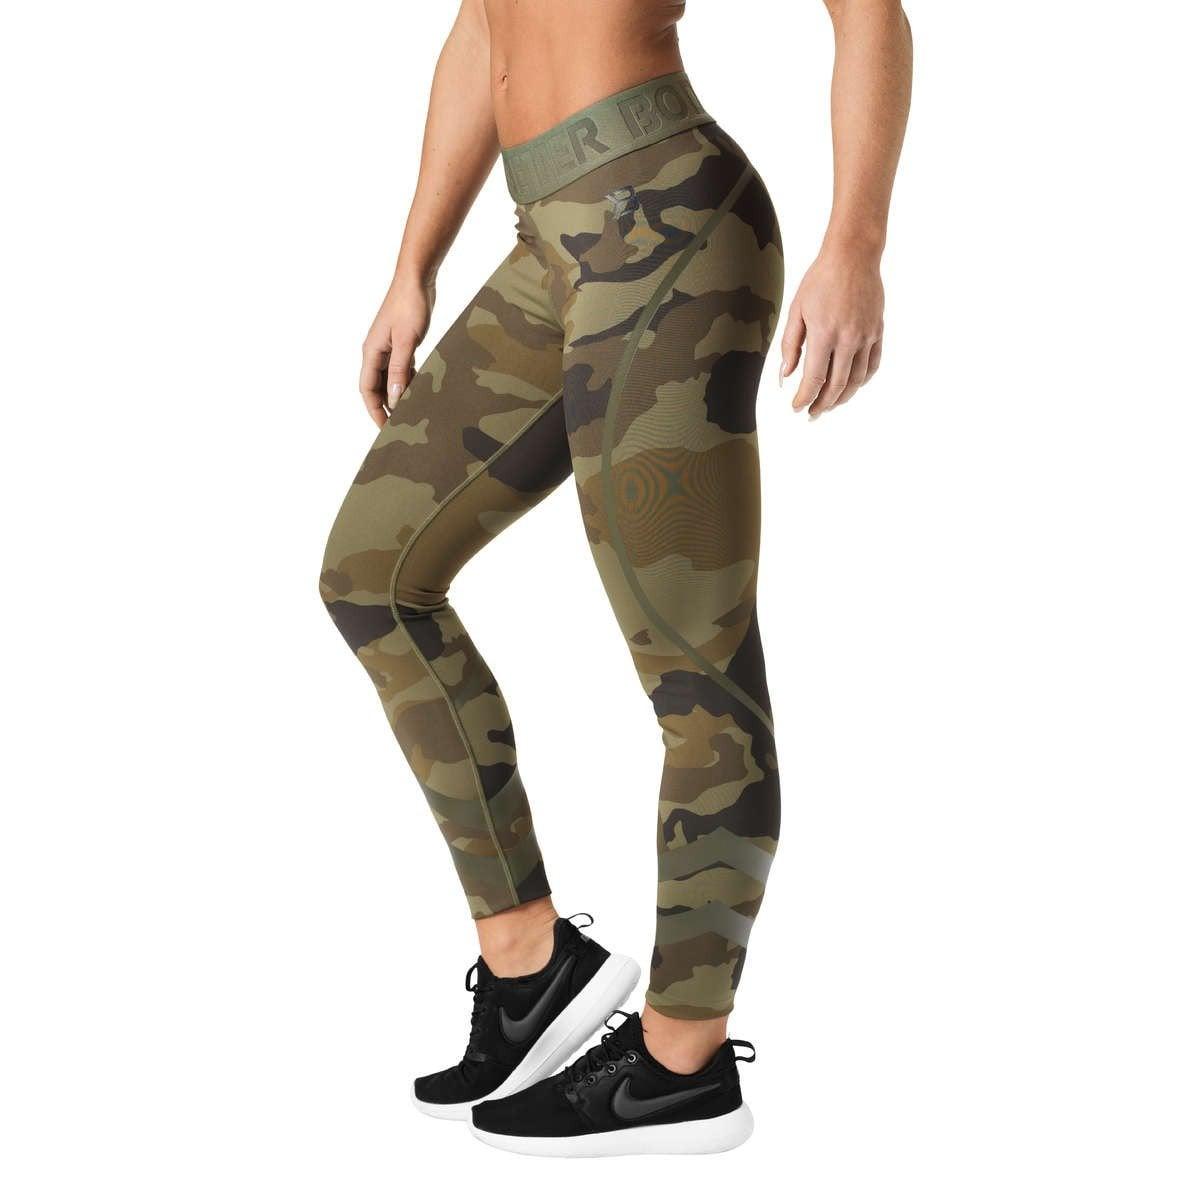 aa8bfa9361fec1 Better Bodies white camo|Better Bodies Tights|Better Bodies Leggings